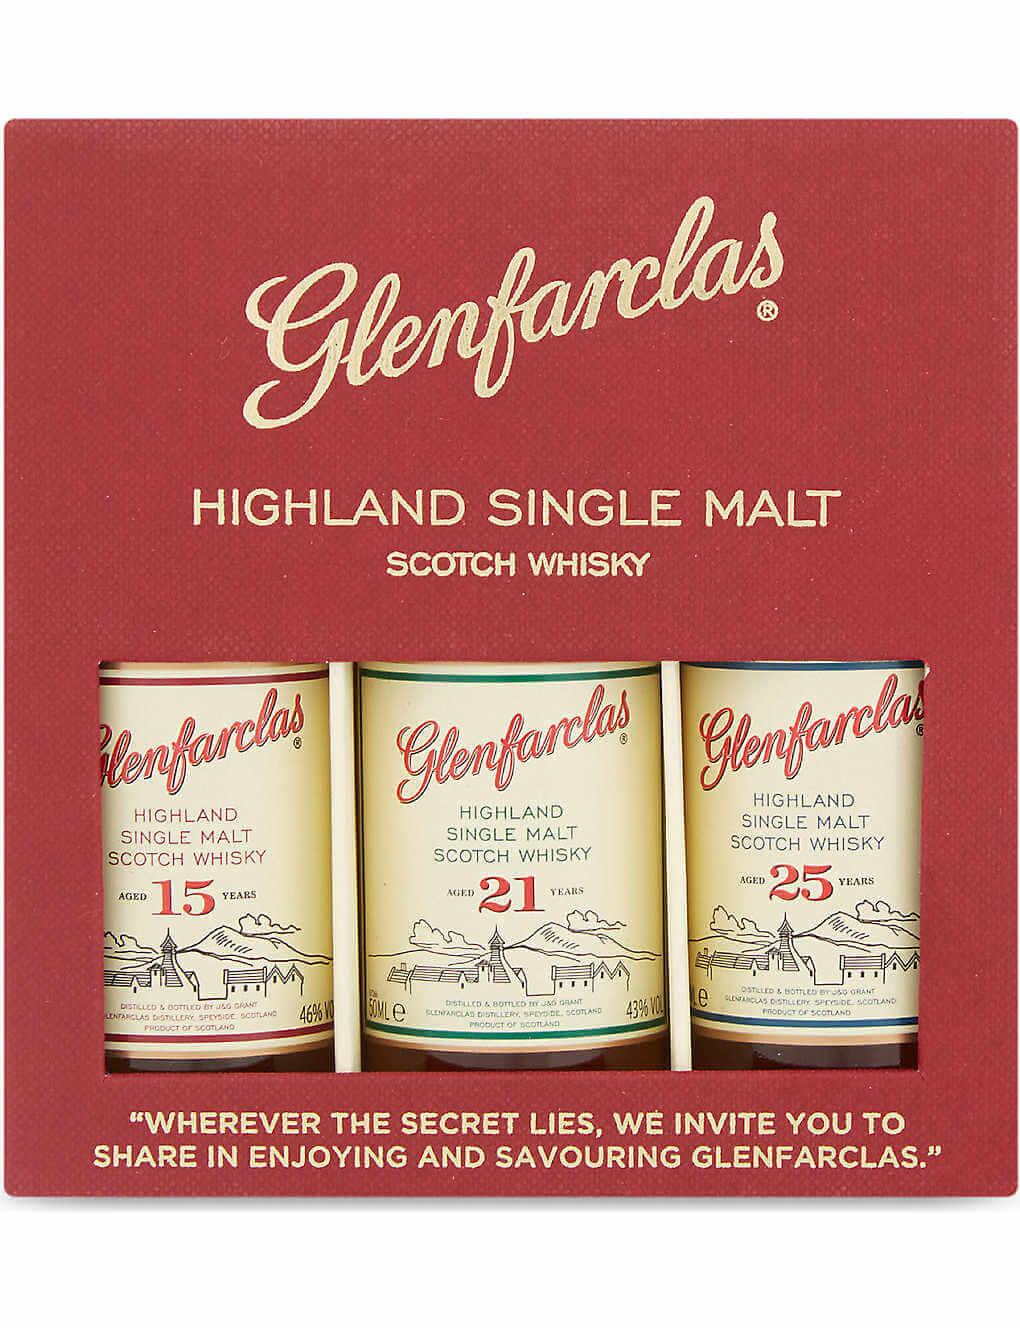 Glenfarclas Whisky Minis - Luxury Travel Gifts for Him